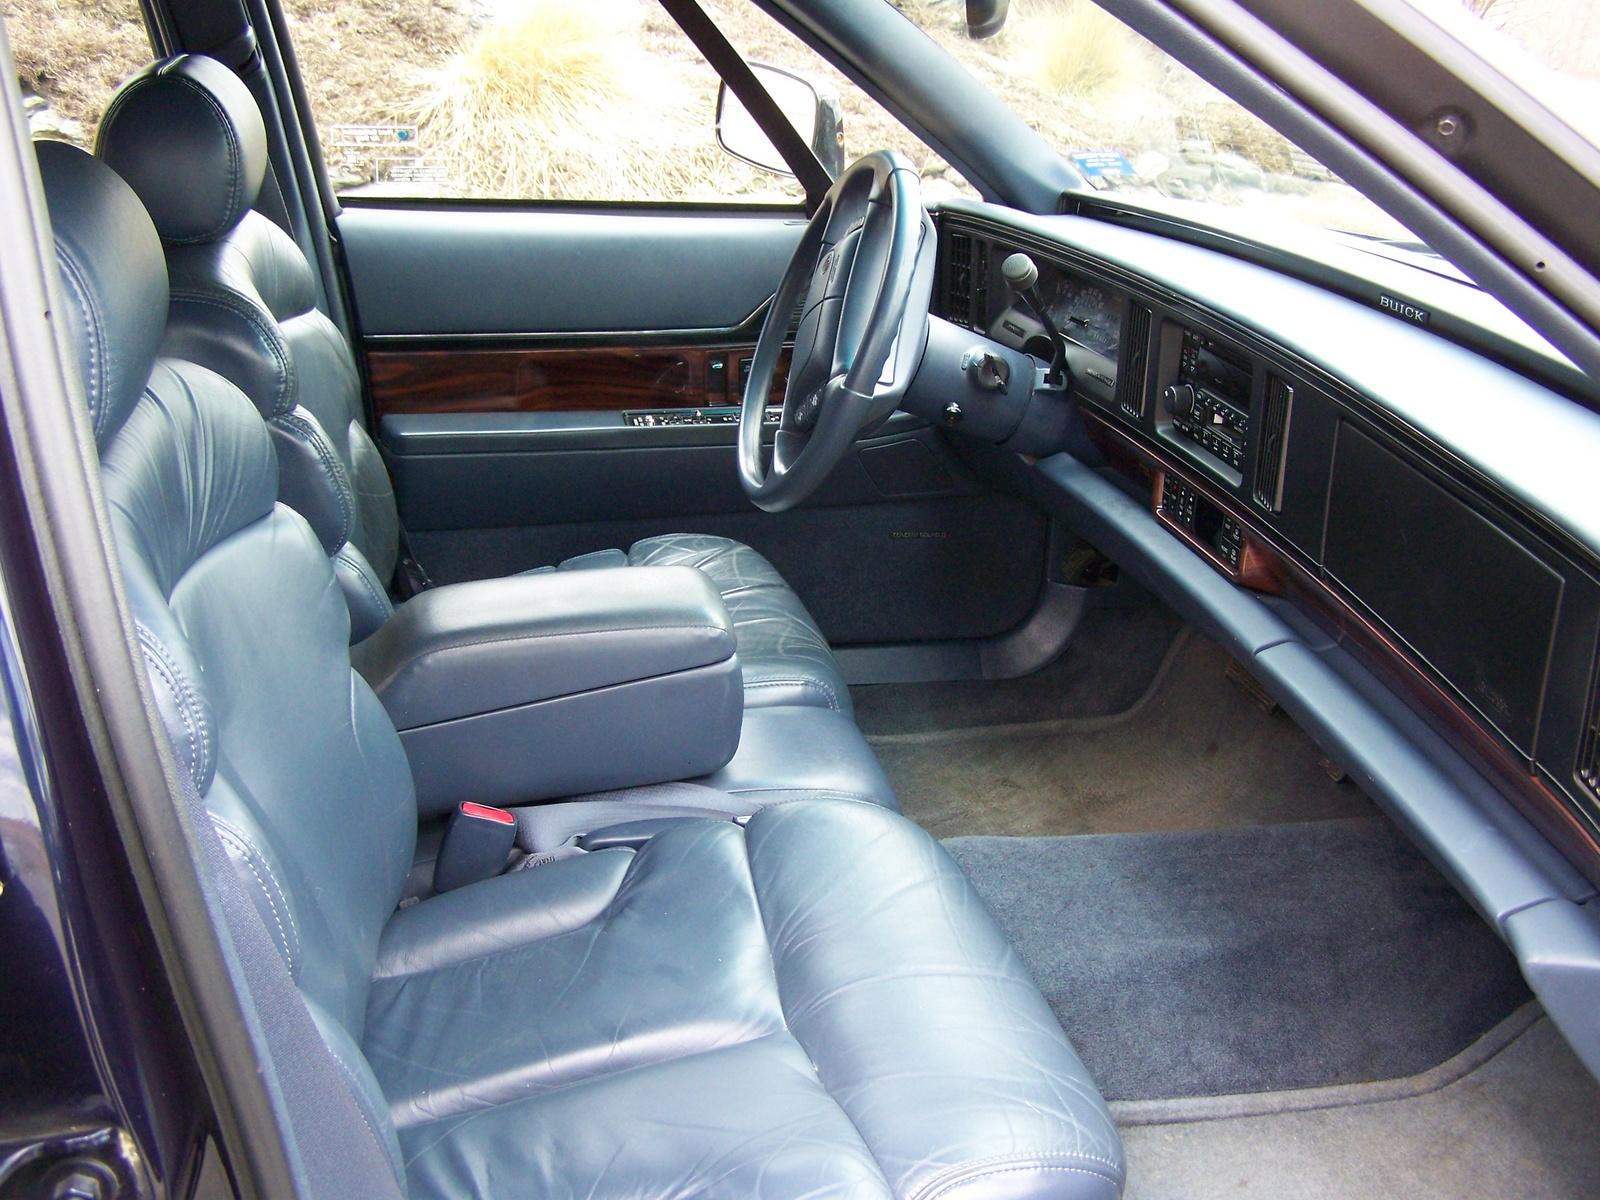 Service Manual Vehicle Repair Manual 2001 Buick Lesabre Interior Lighting 2002 Titanium Blue